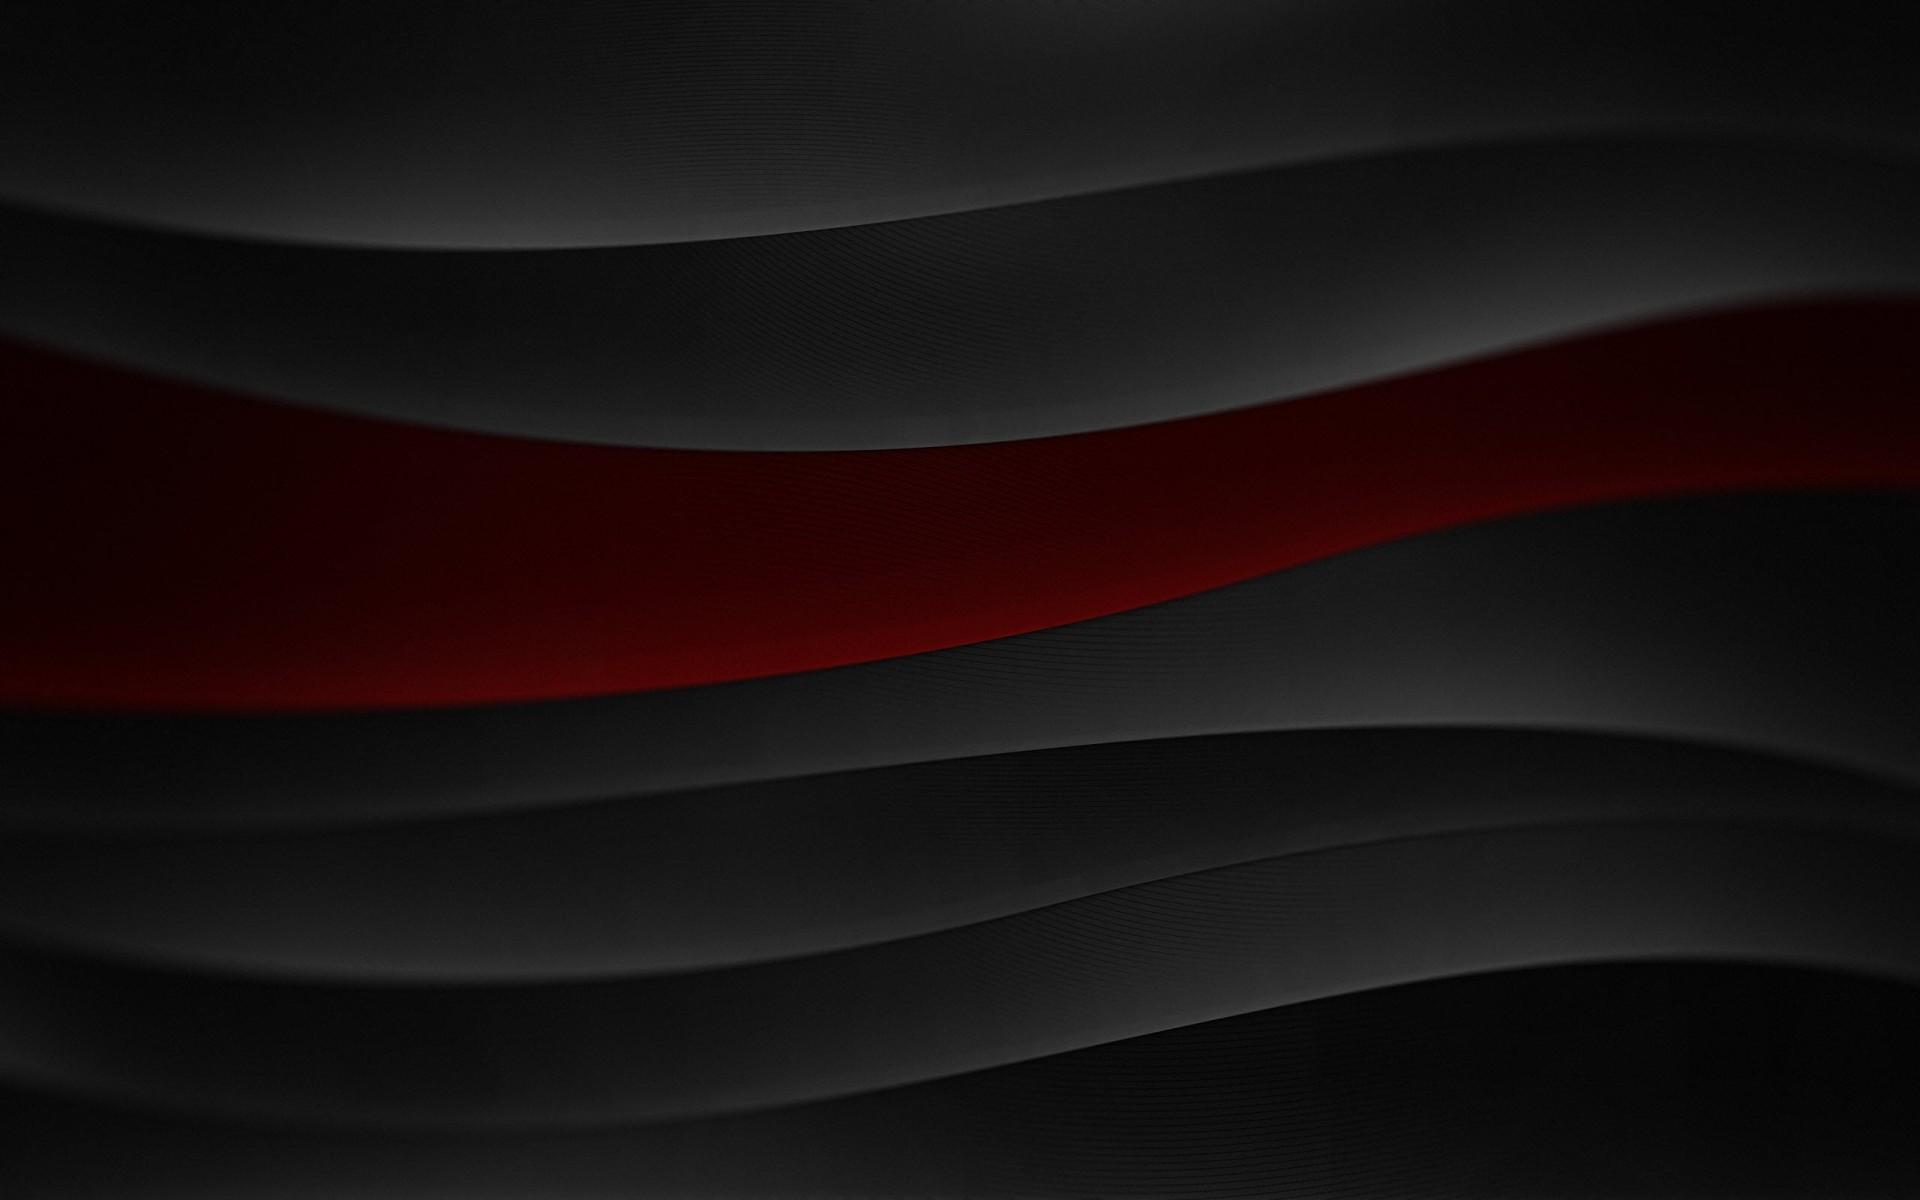 red black wallpaper РȘk p̴ Google   wallpapers   Pinterest   Black  wallpaper and Wallpaper